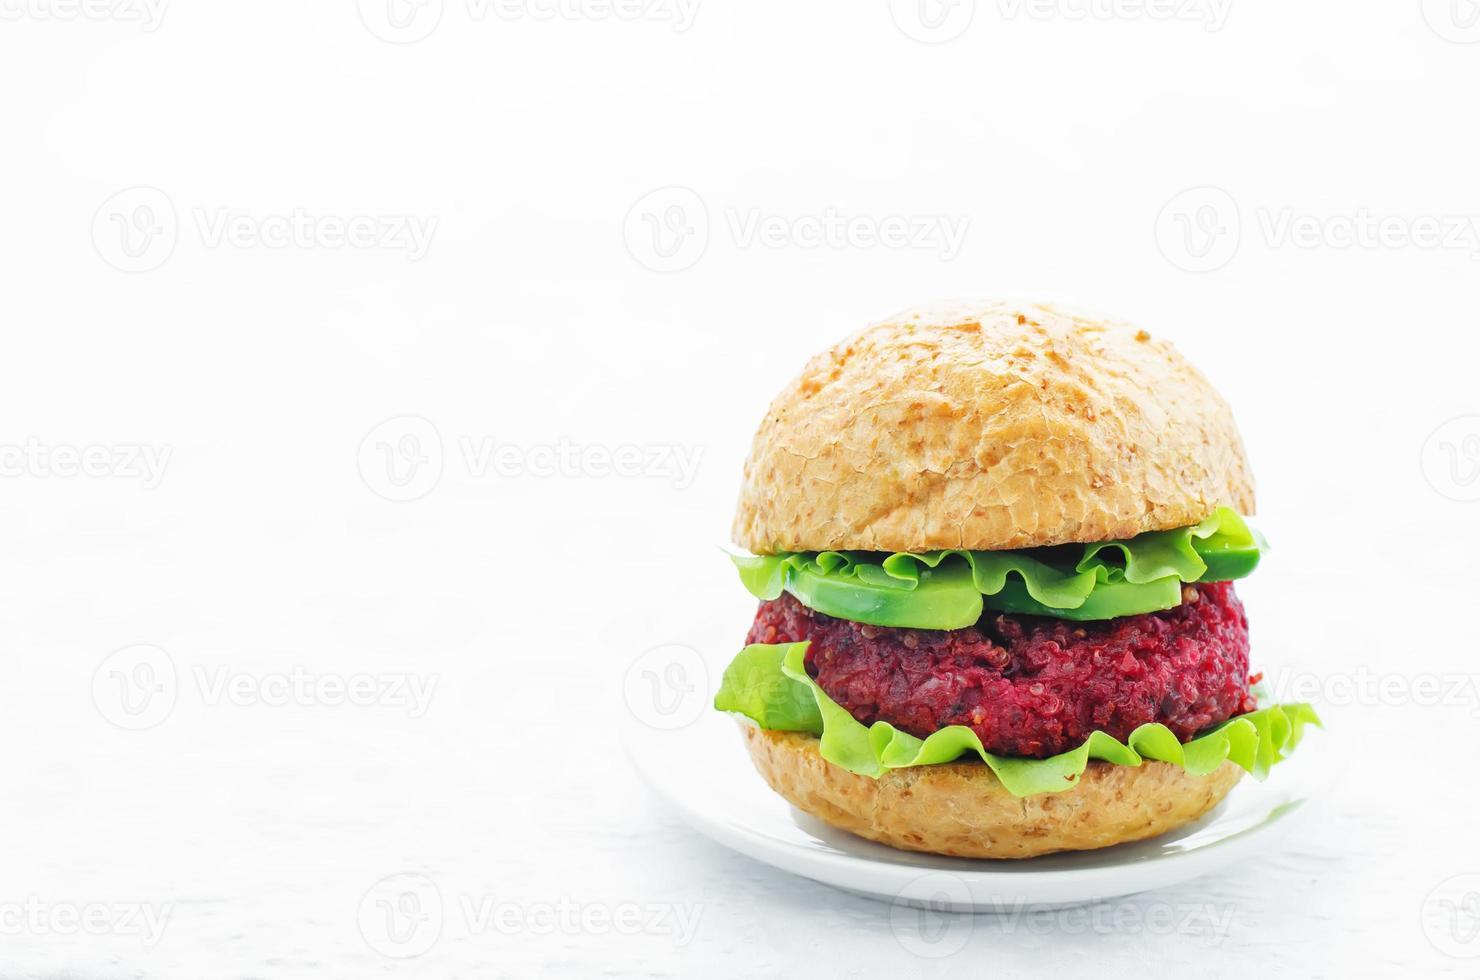 hambúrgueres de quinoa, beterraba e grão de bico foto